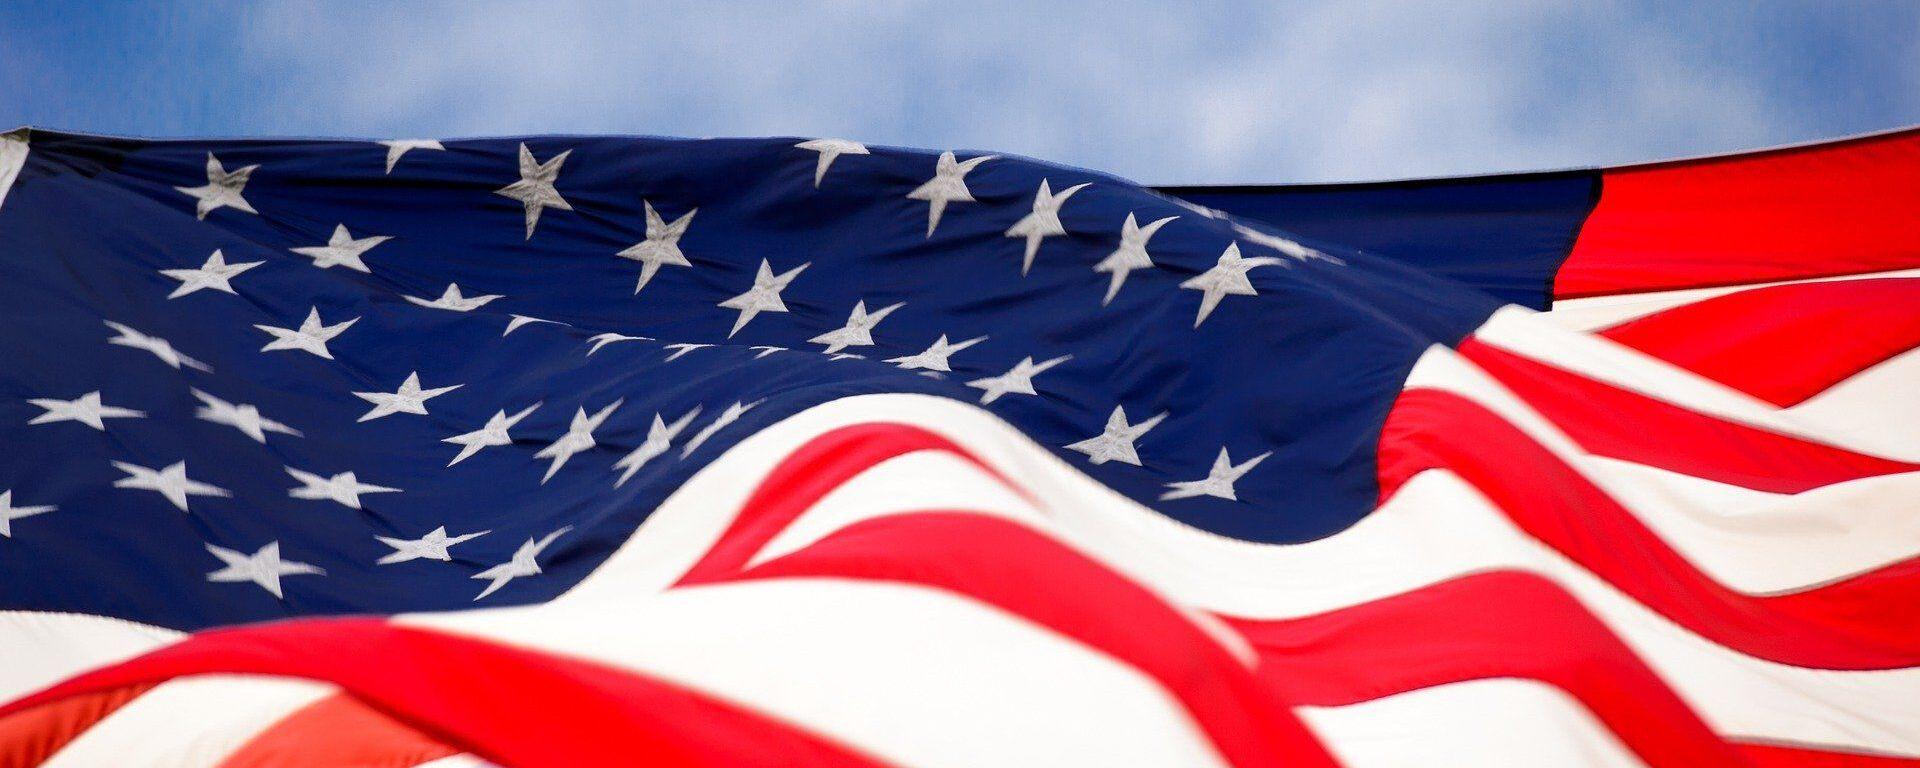 Bandera de EEUU - Sputnik Mundo, 1920, 16.06.2021